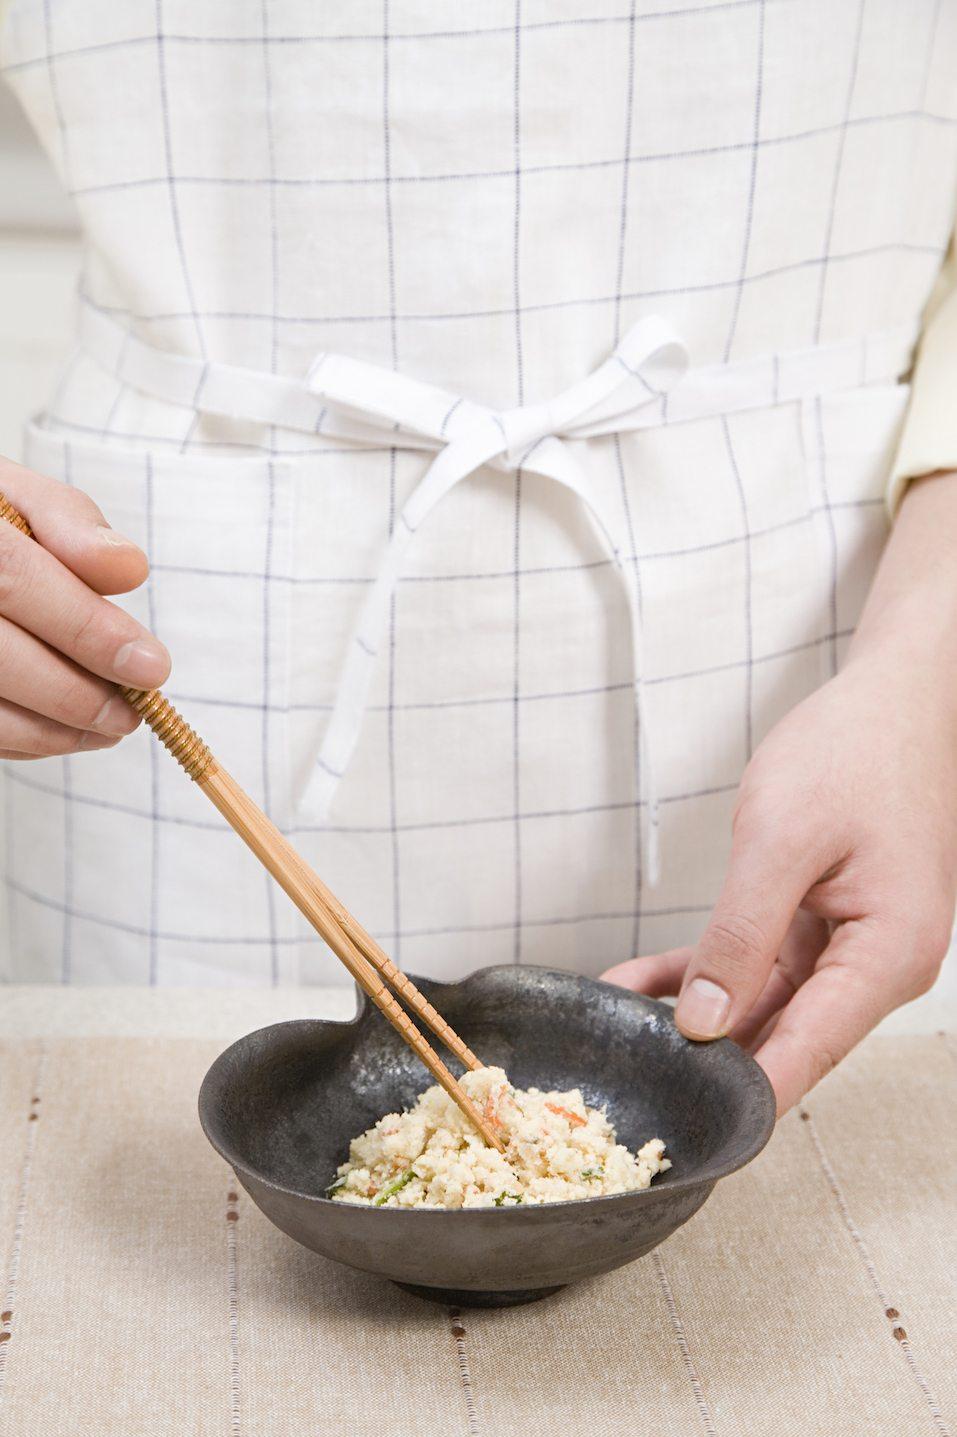 Person holding bowl of okara